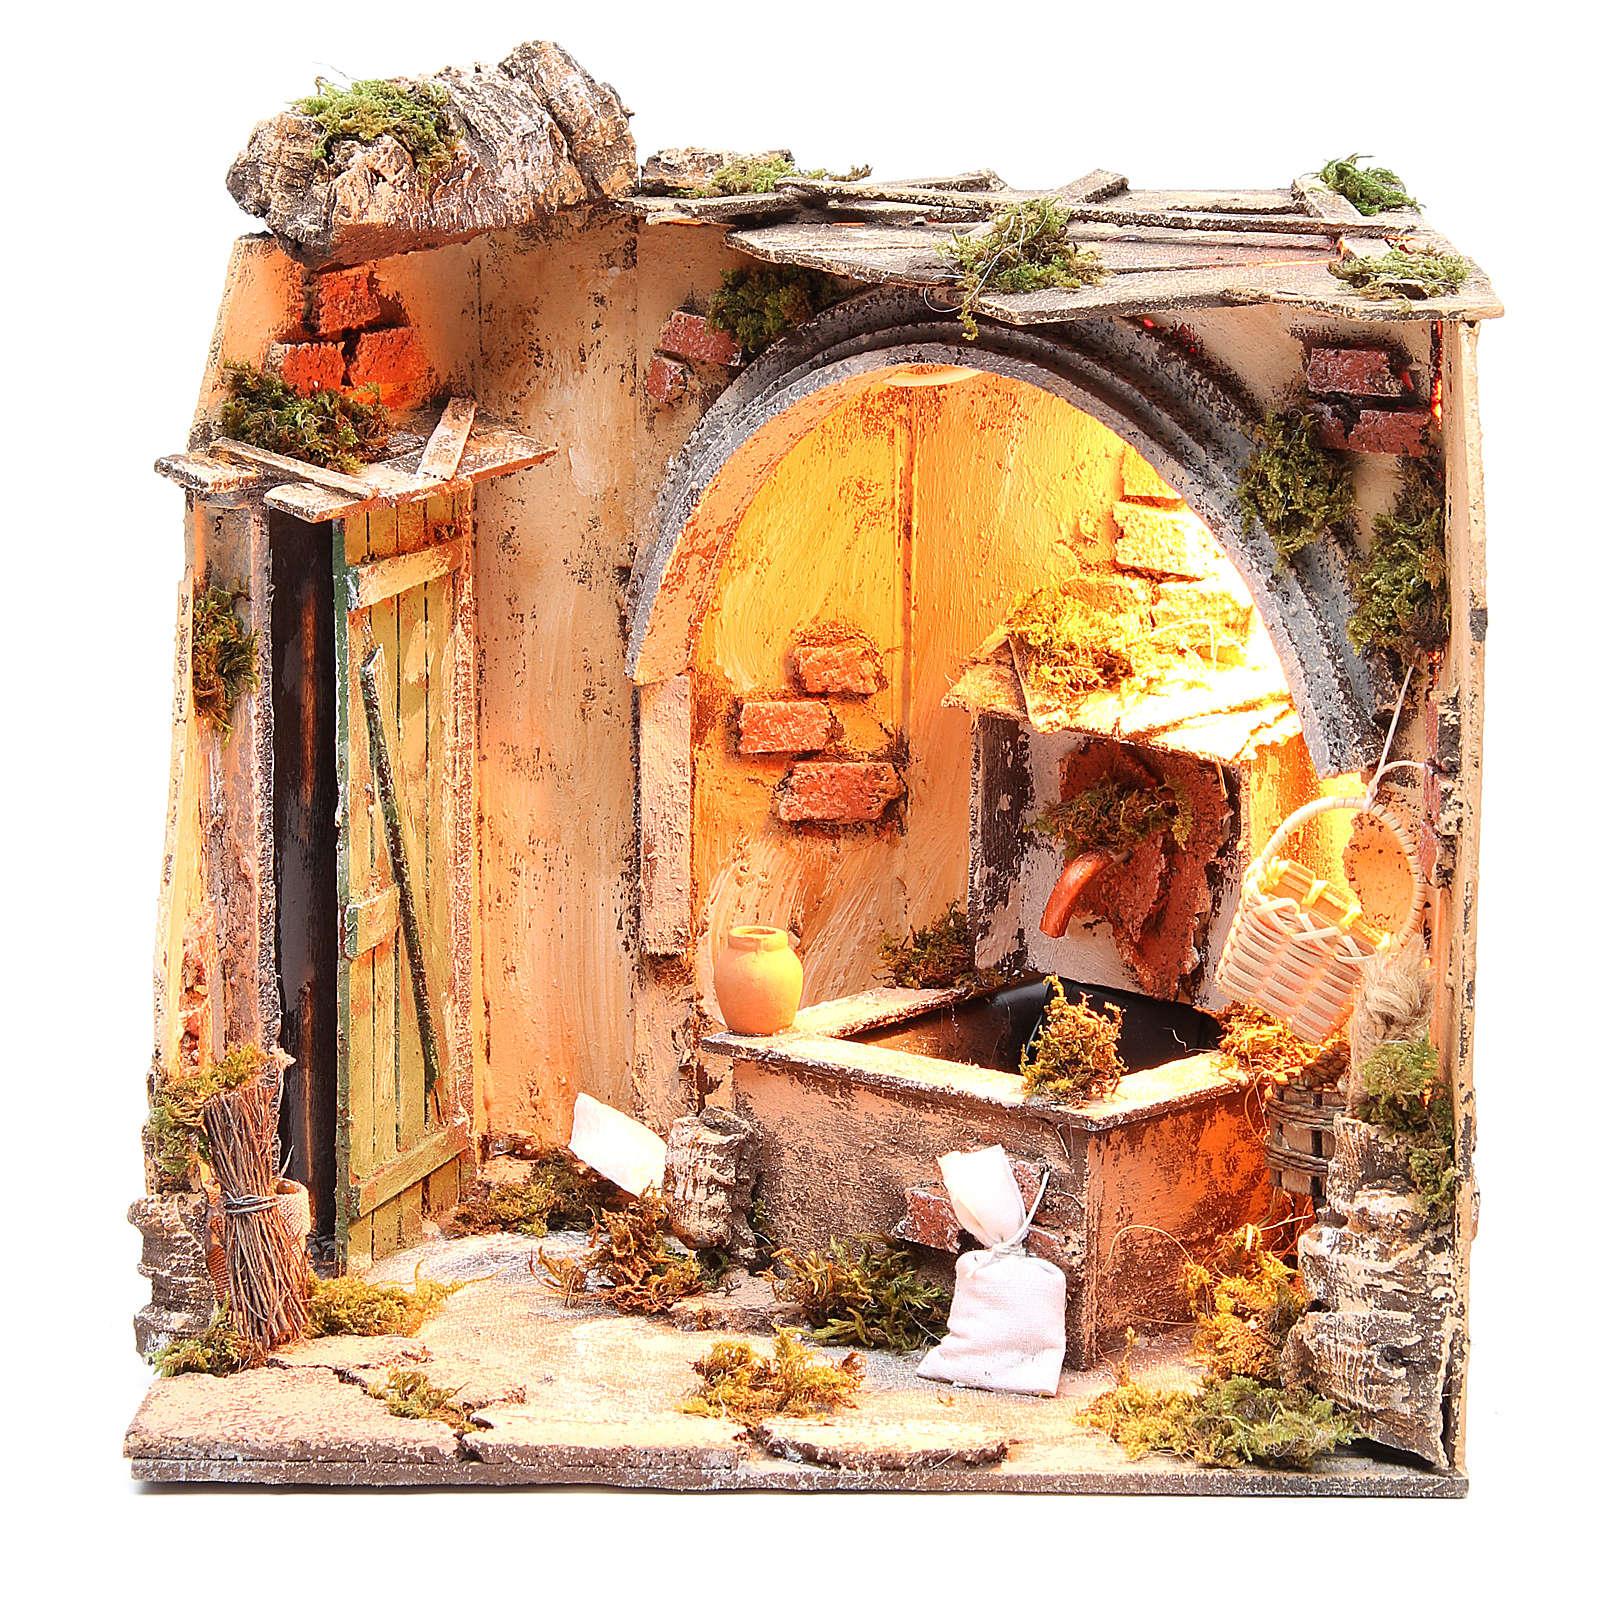 Setting basement & fountain 28x26x24 cm Neapolitan Nativity 4